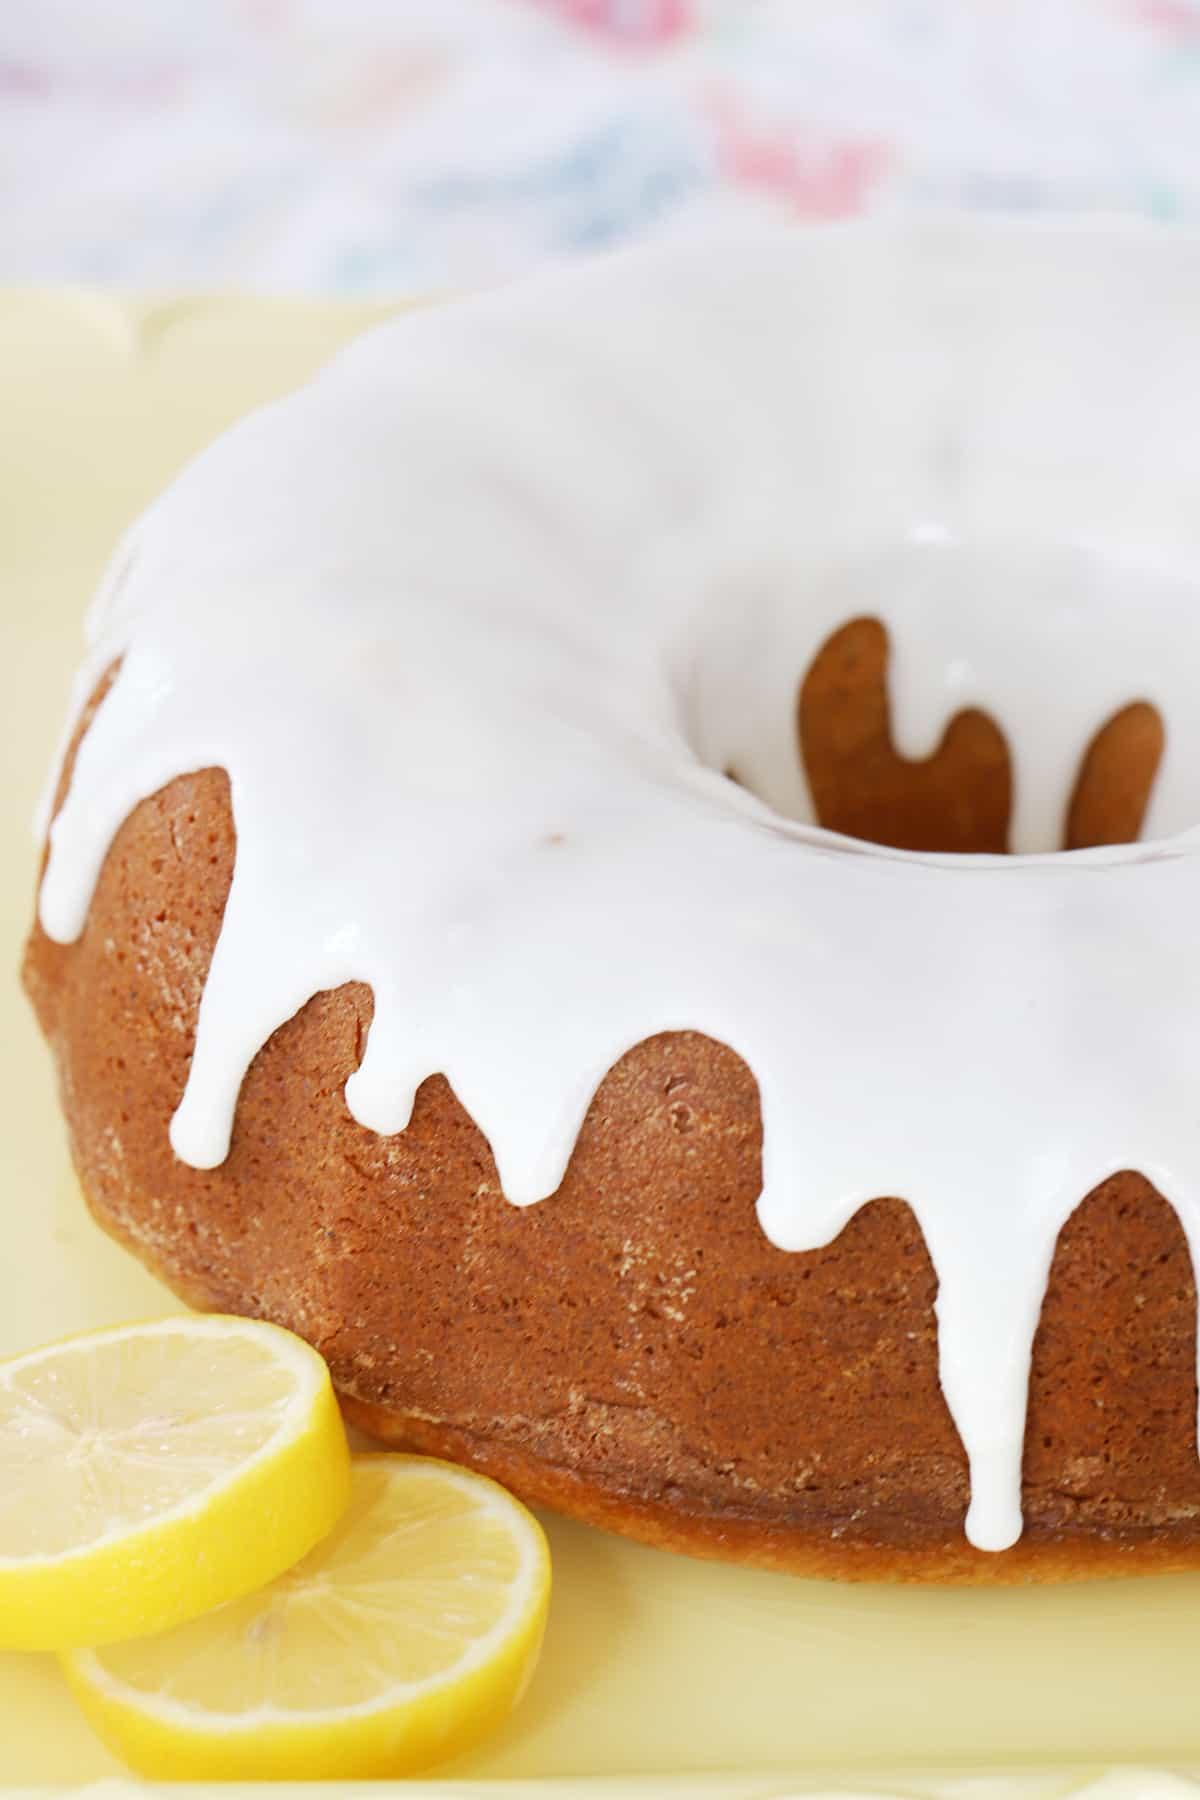 A whole glazed bundt cake on a serving platter with slices of fresh lemon.